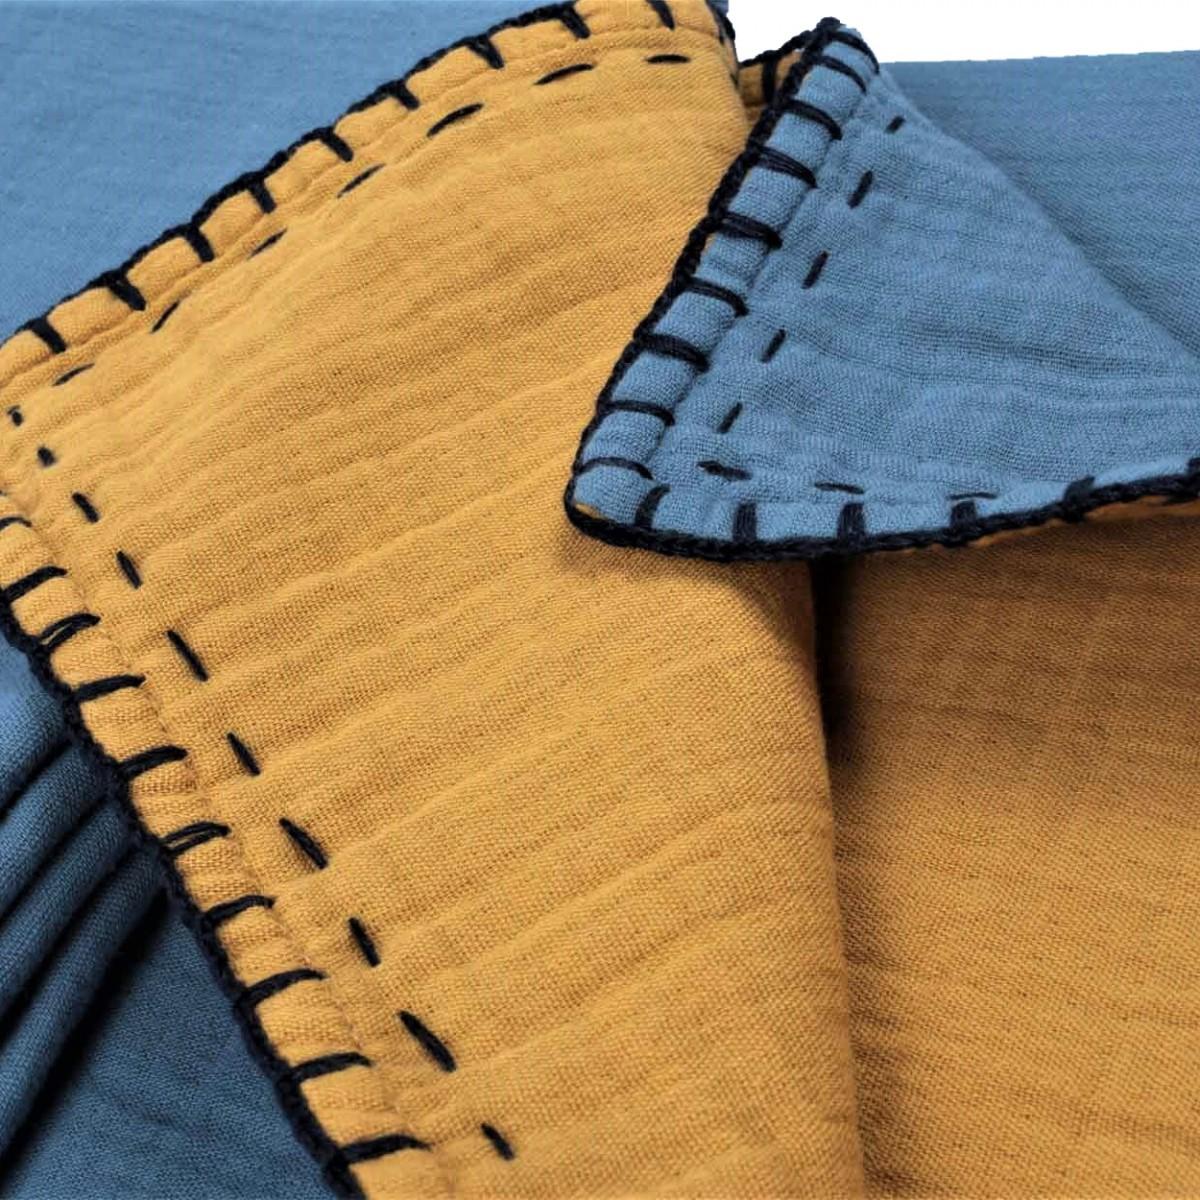 Двулицево муселиново бебешко одеяло Cottonseed